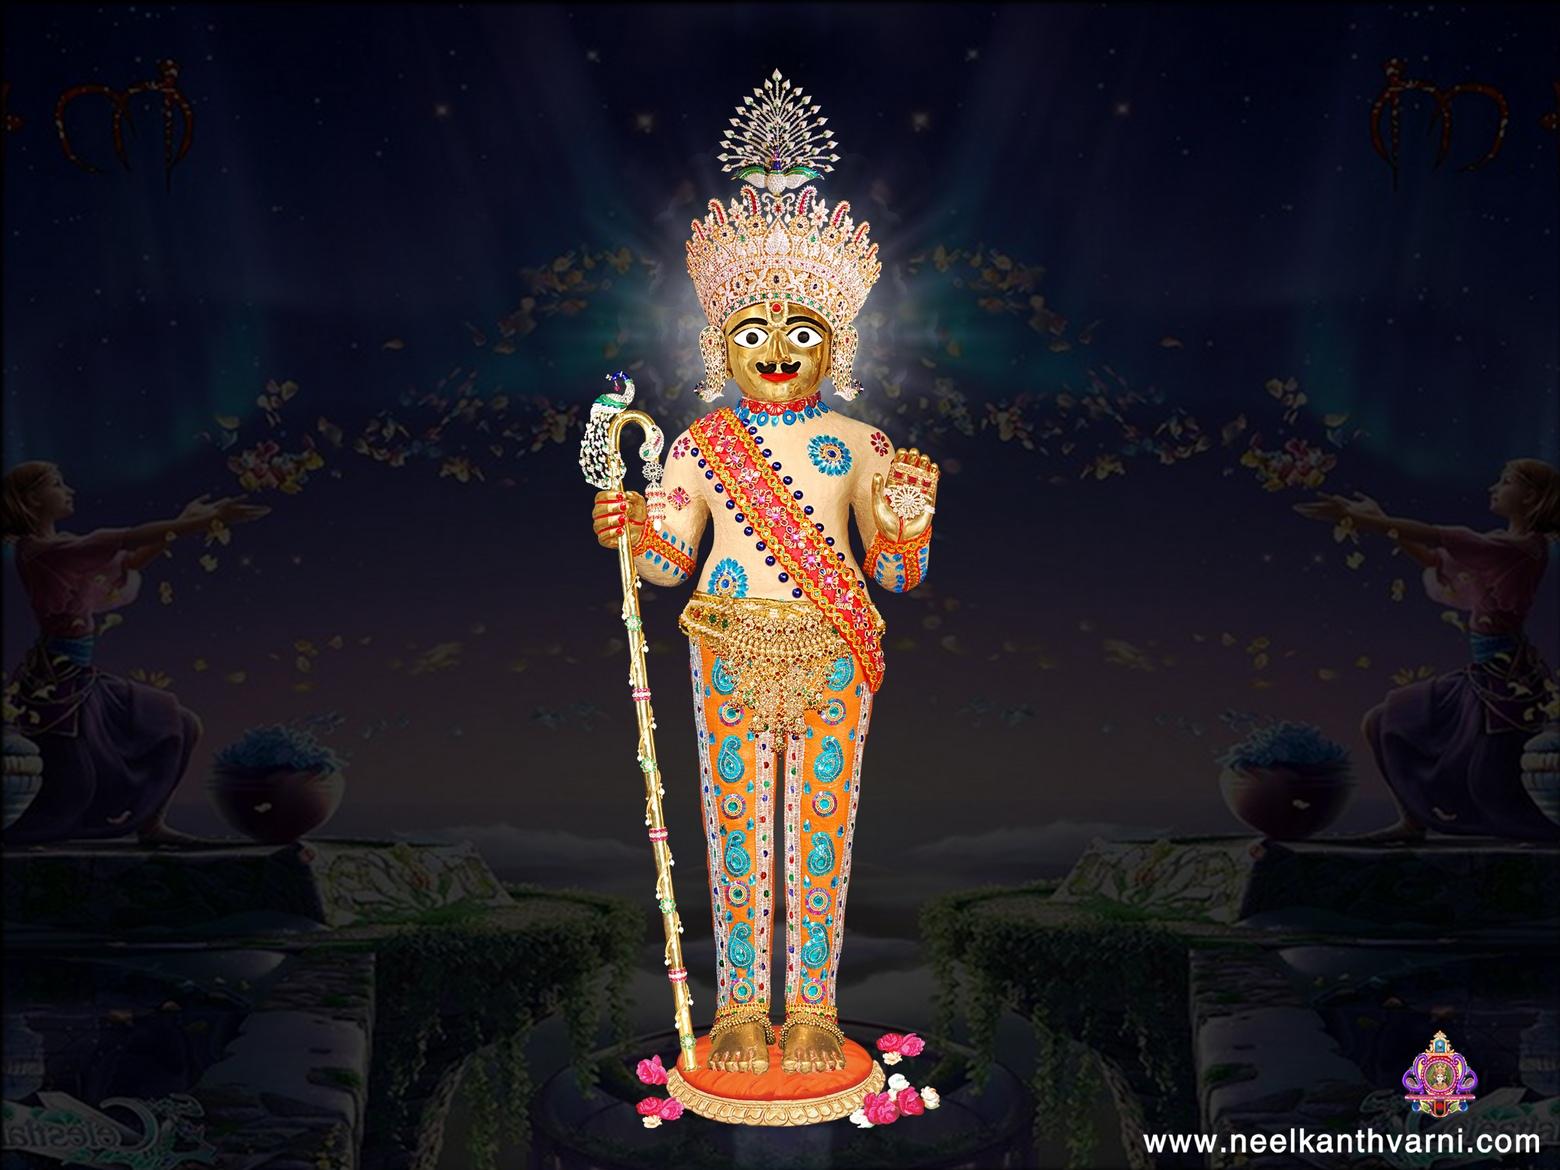 Hanuman Ji 3d Wallpaper Download Jay Swaminarayan Wallpapers Harikrishna Maharaj Vadtal Images